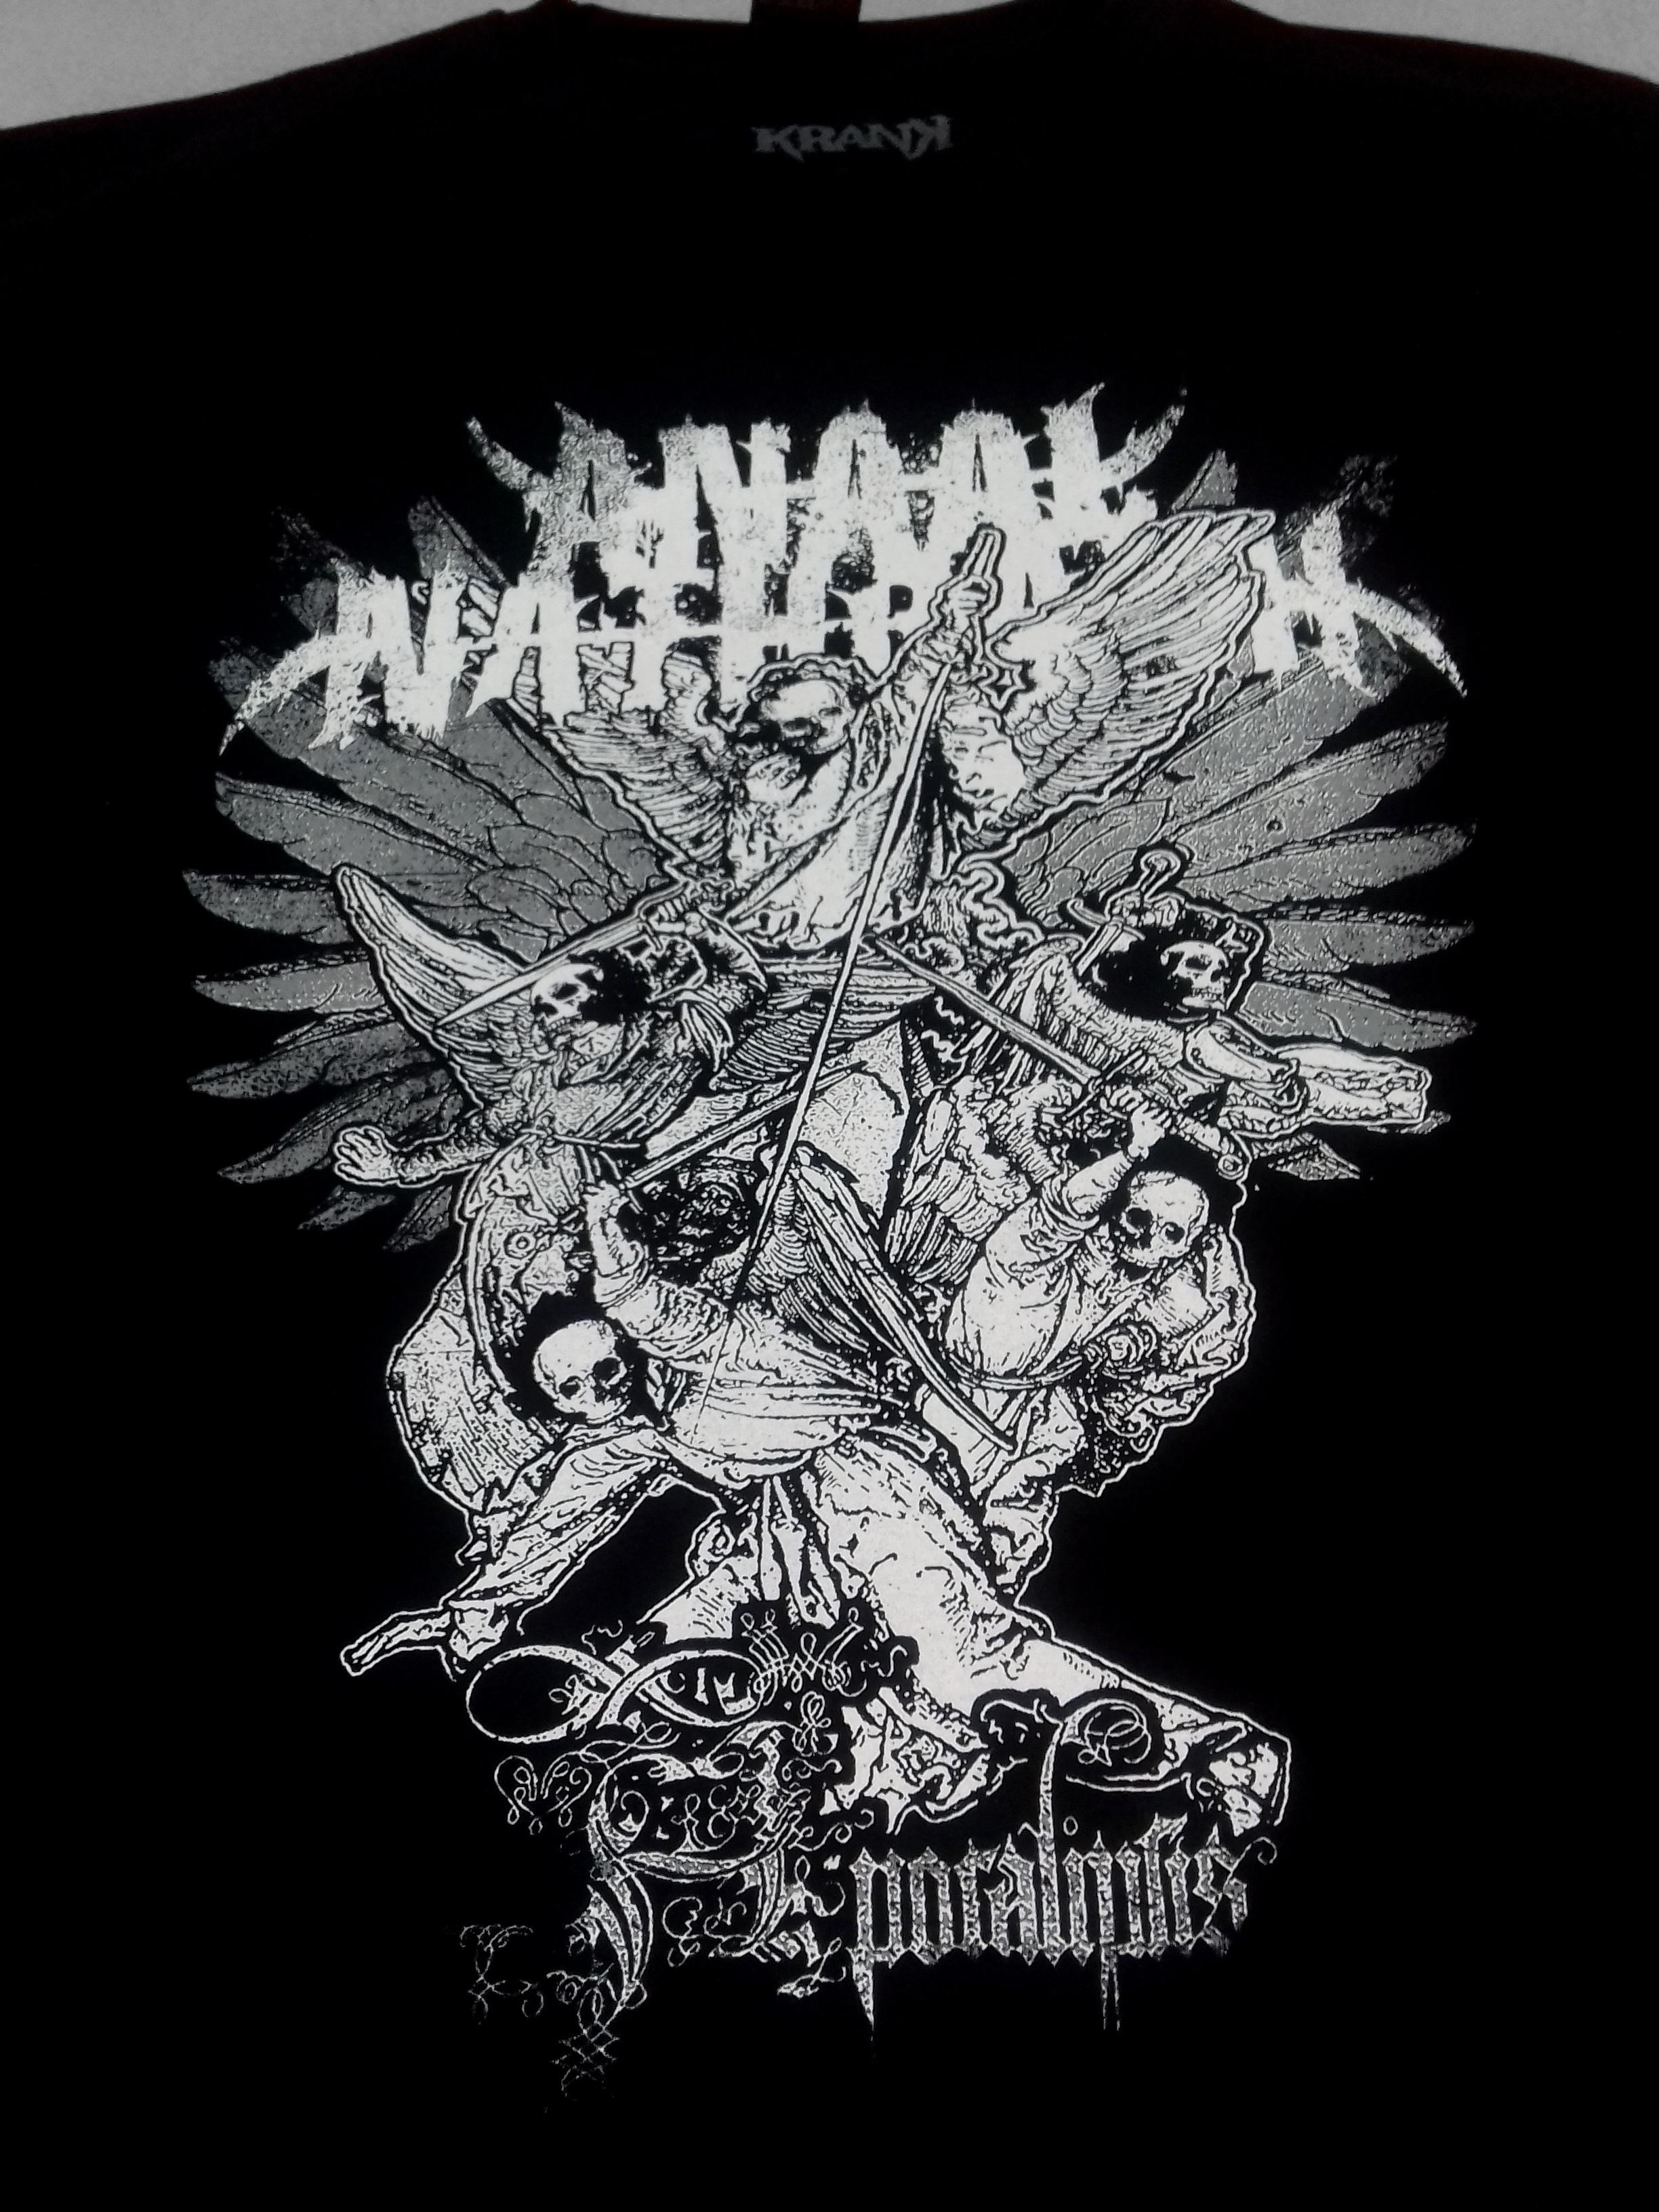 ANAAL NATHRAHK